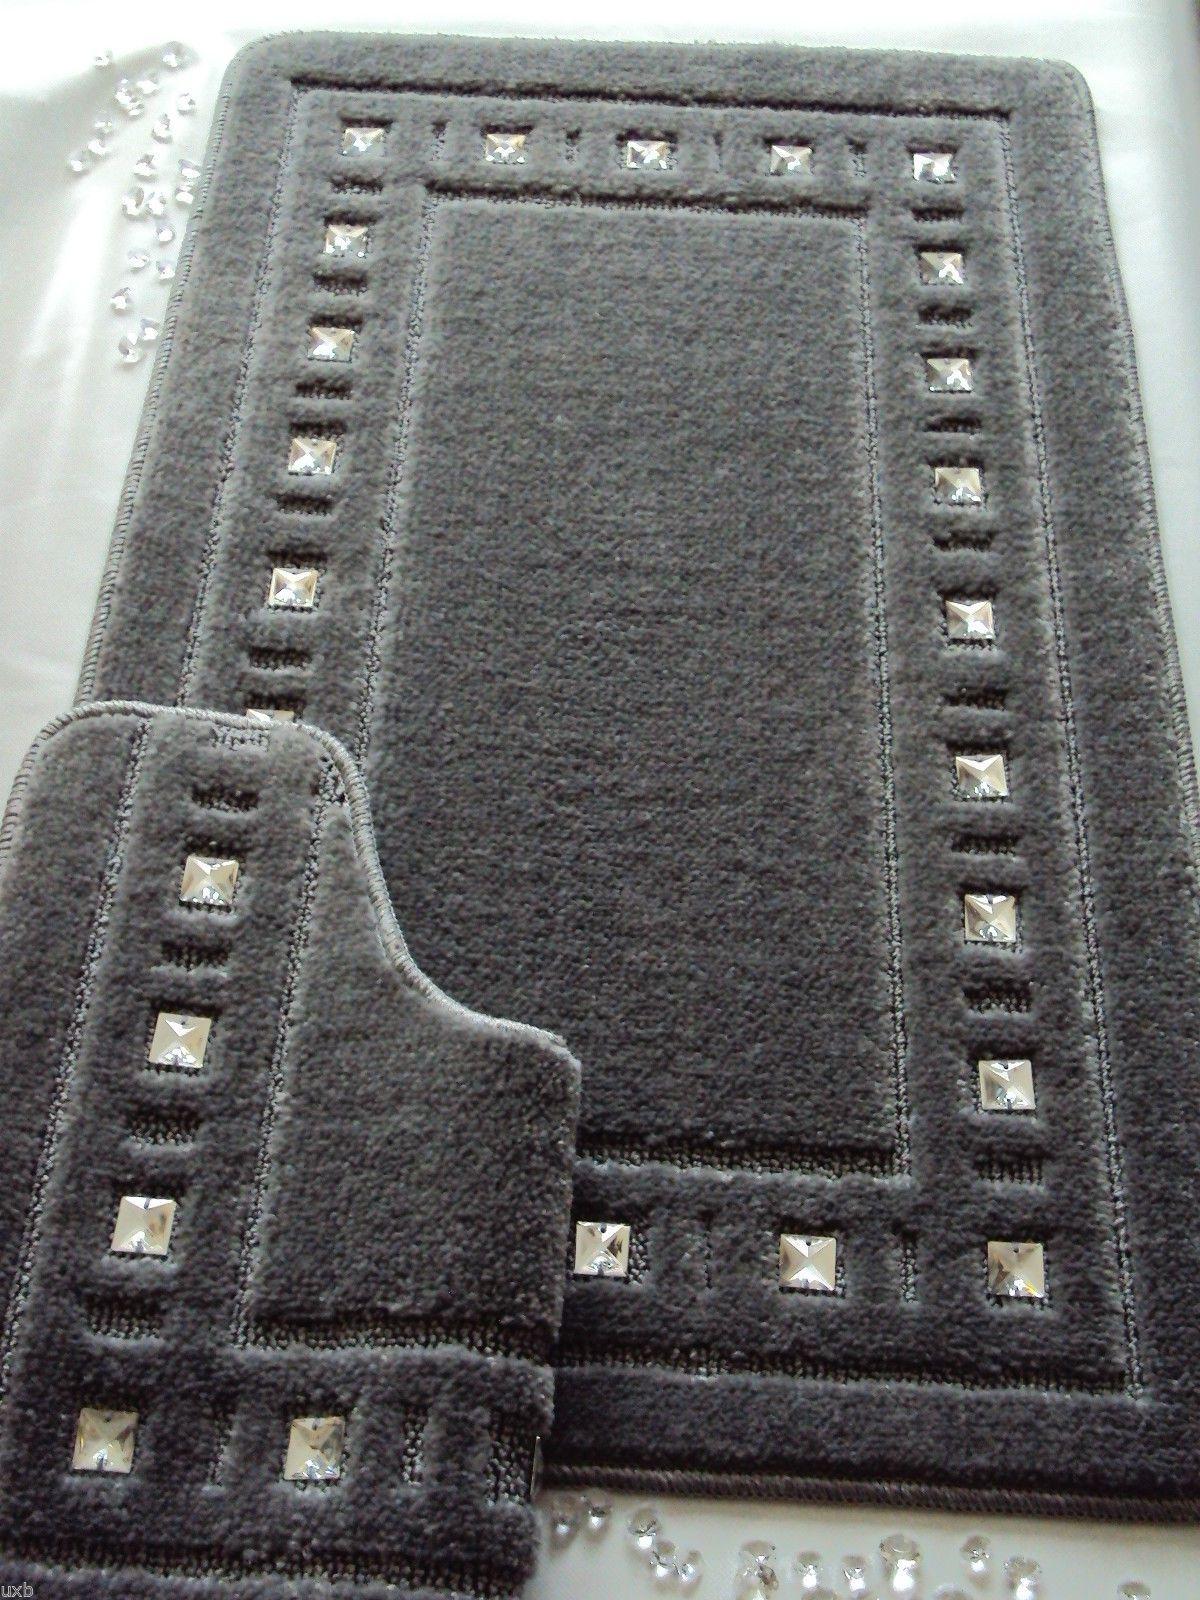 Bath Mat Set Diamante Silver Grey Bathroom Rug Sets Black Bathroom Rug Set Bathroom Mat Sets